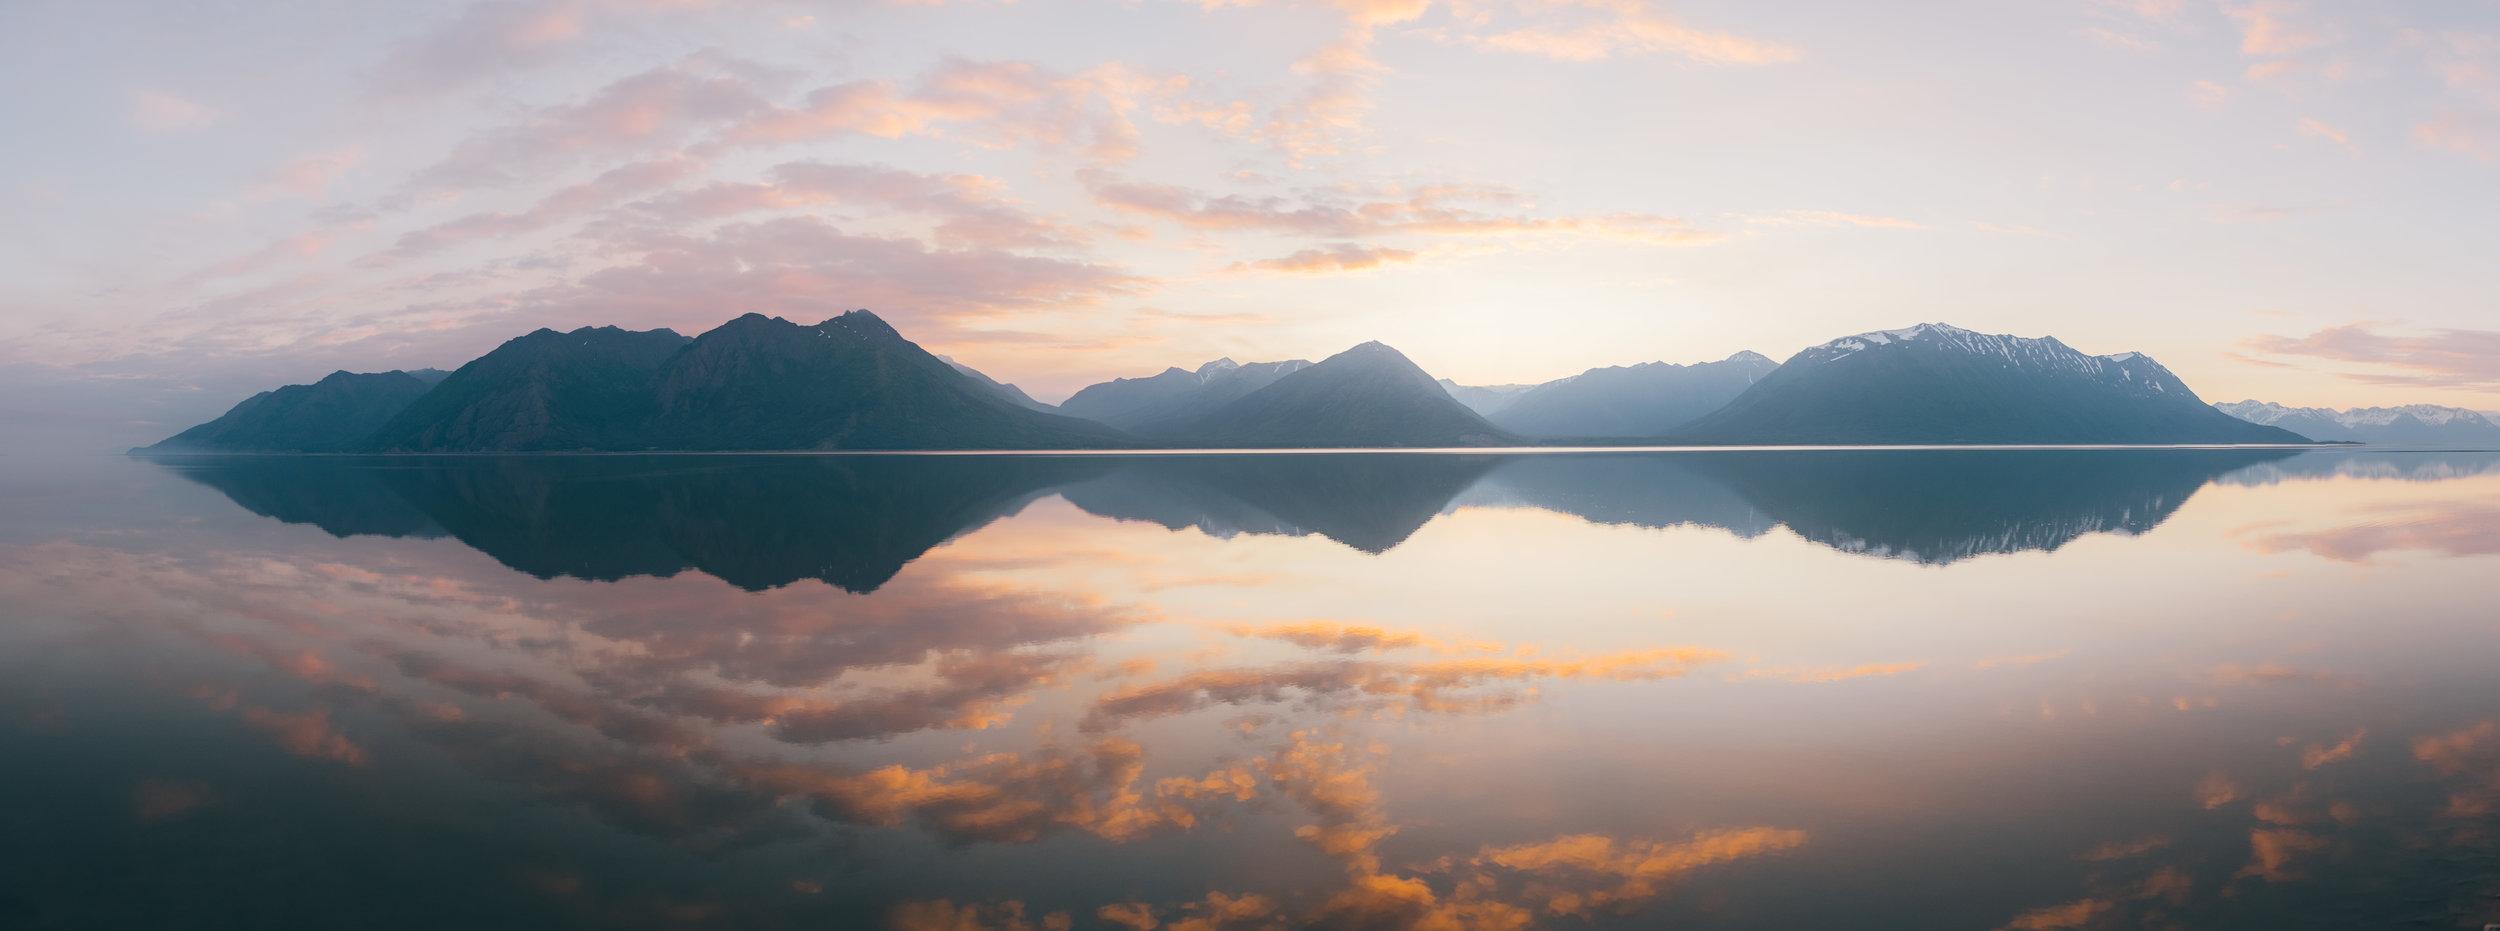 Mountainreflection1-1.jpg